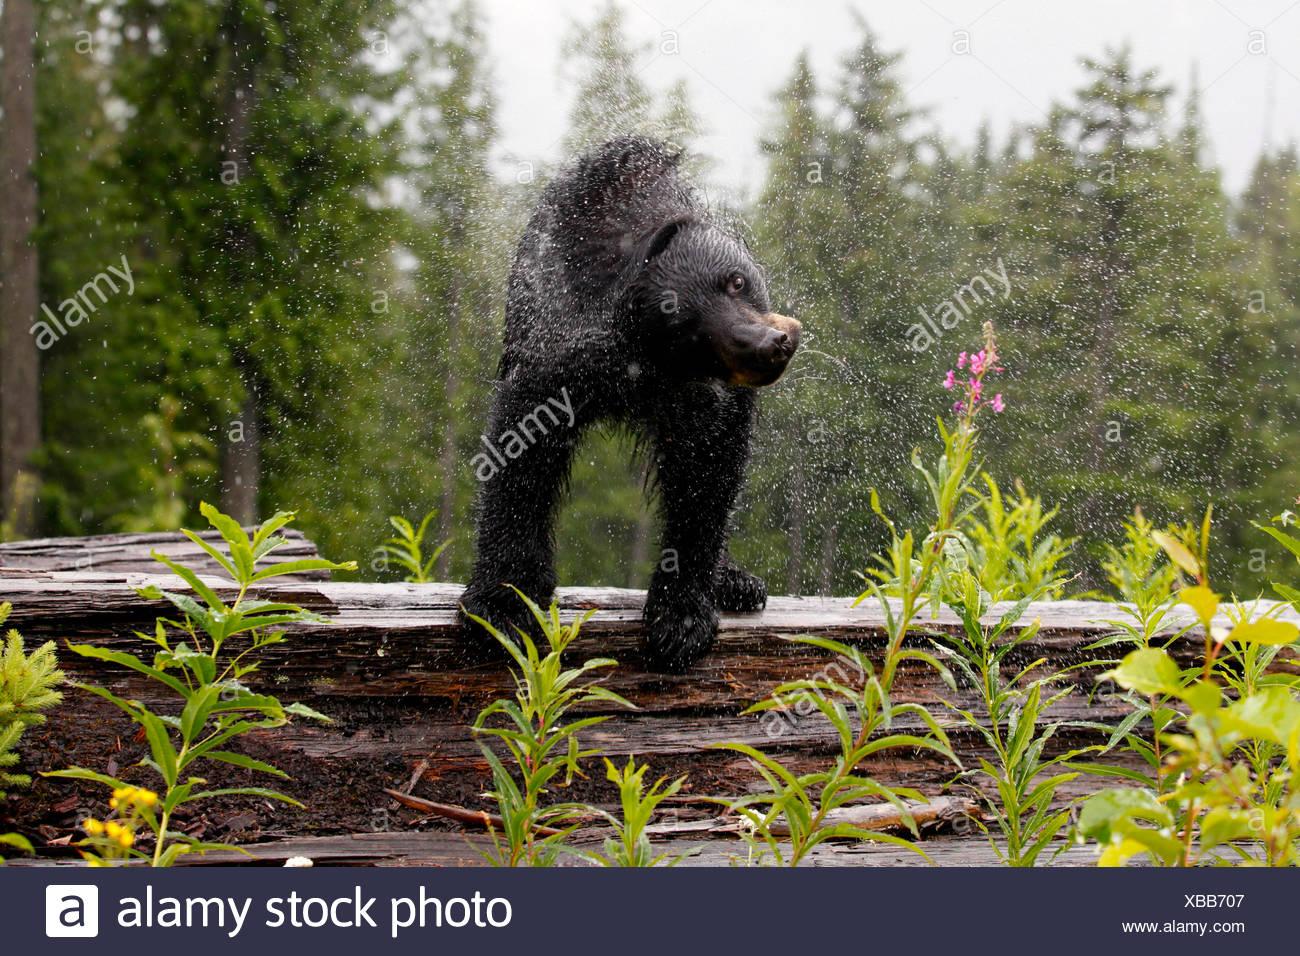 Un oso negro, Ursus americanus, agita el agua fuera de sí mismo. Imagen De Stock